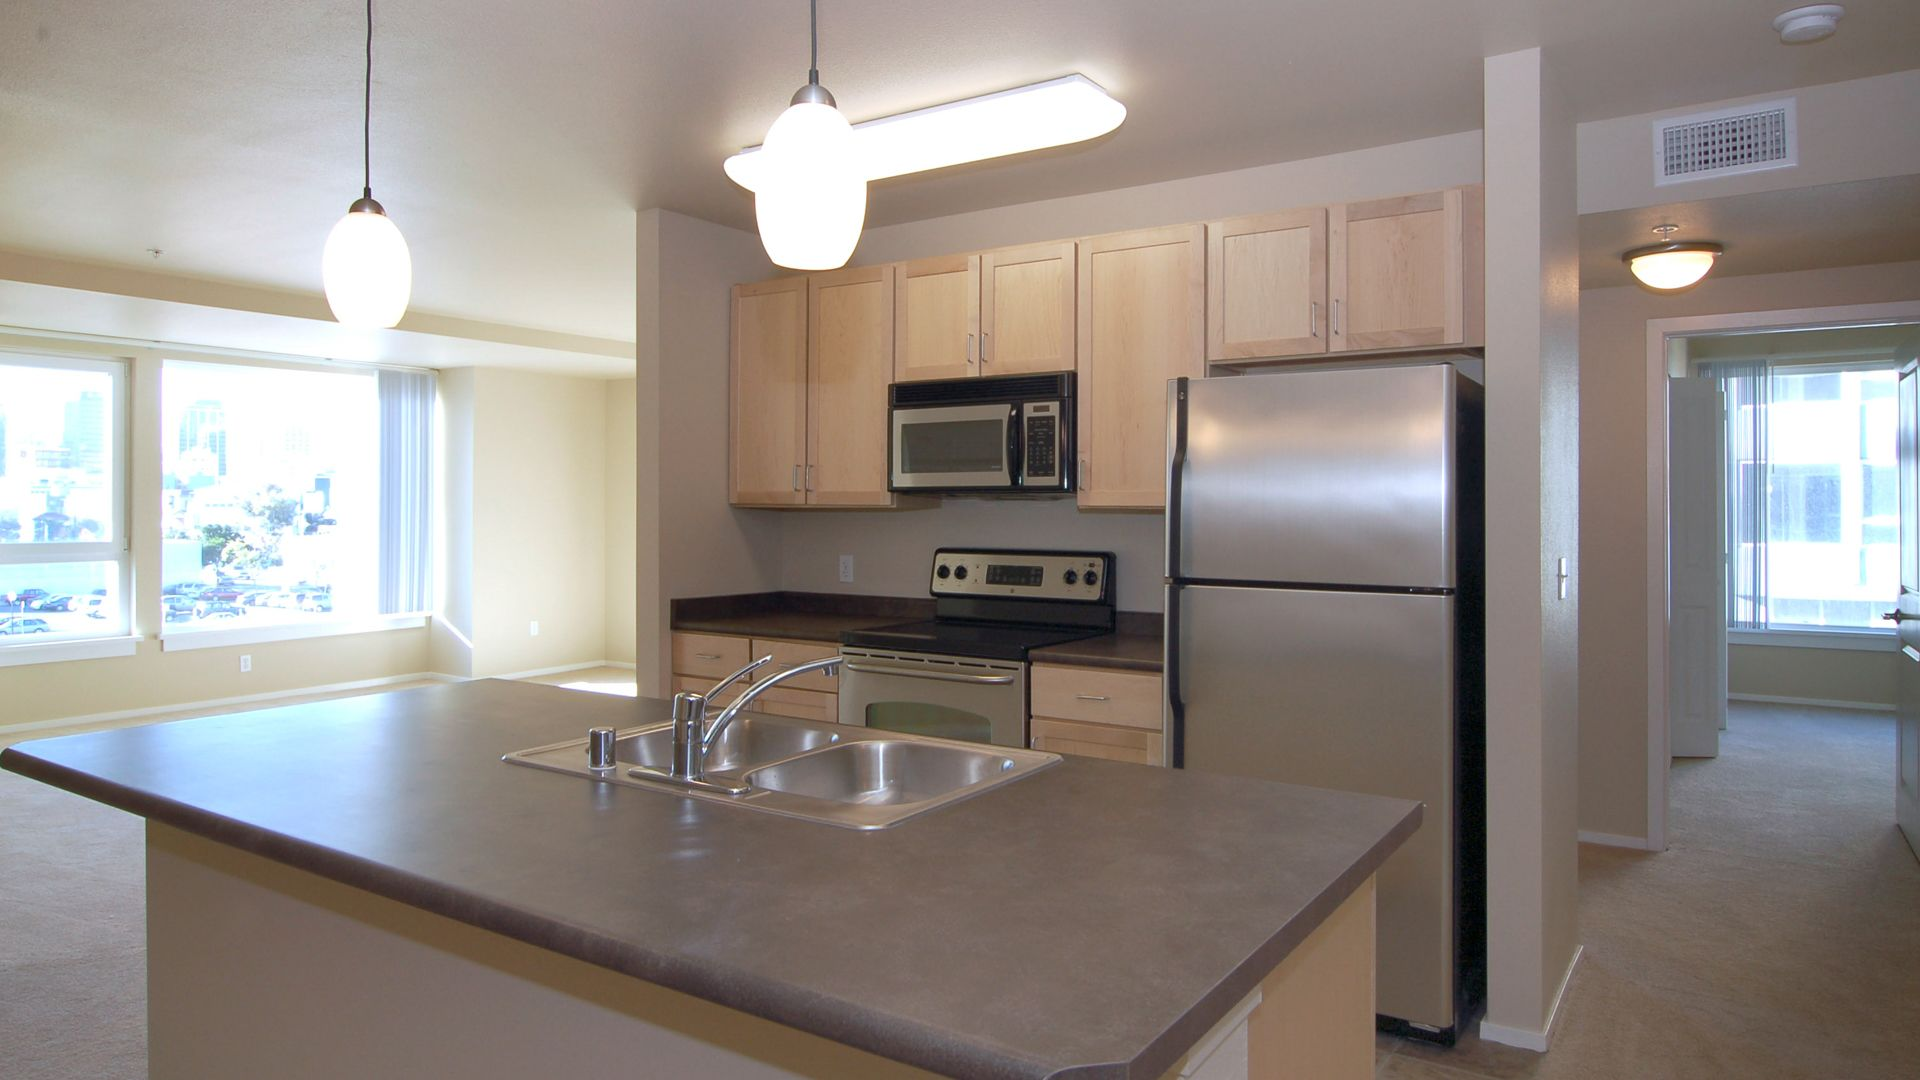 Market Street Village Apartments - Kitchen